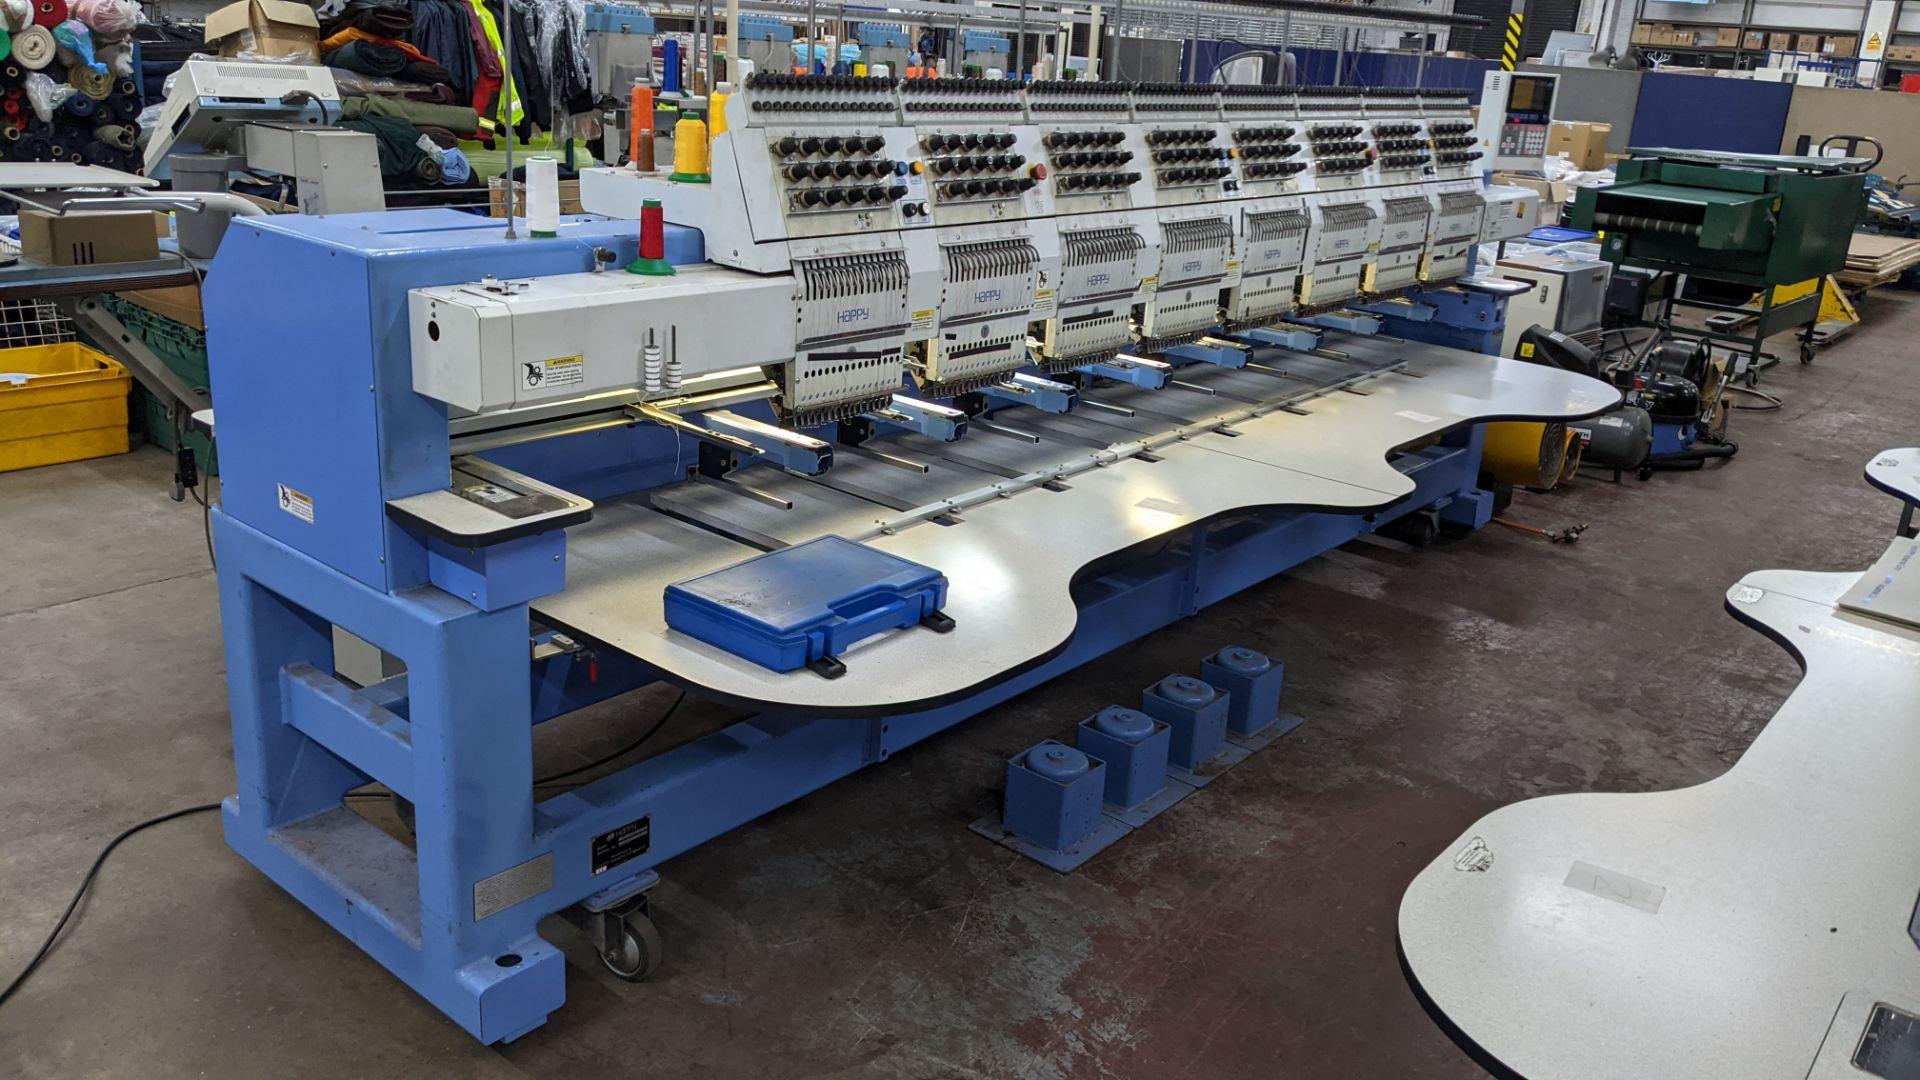 Happy 8 head embroidery machine, model HCG-1508B-45TTC, 15 needles per head, including frames & othe - Image 2 of 32